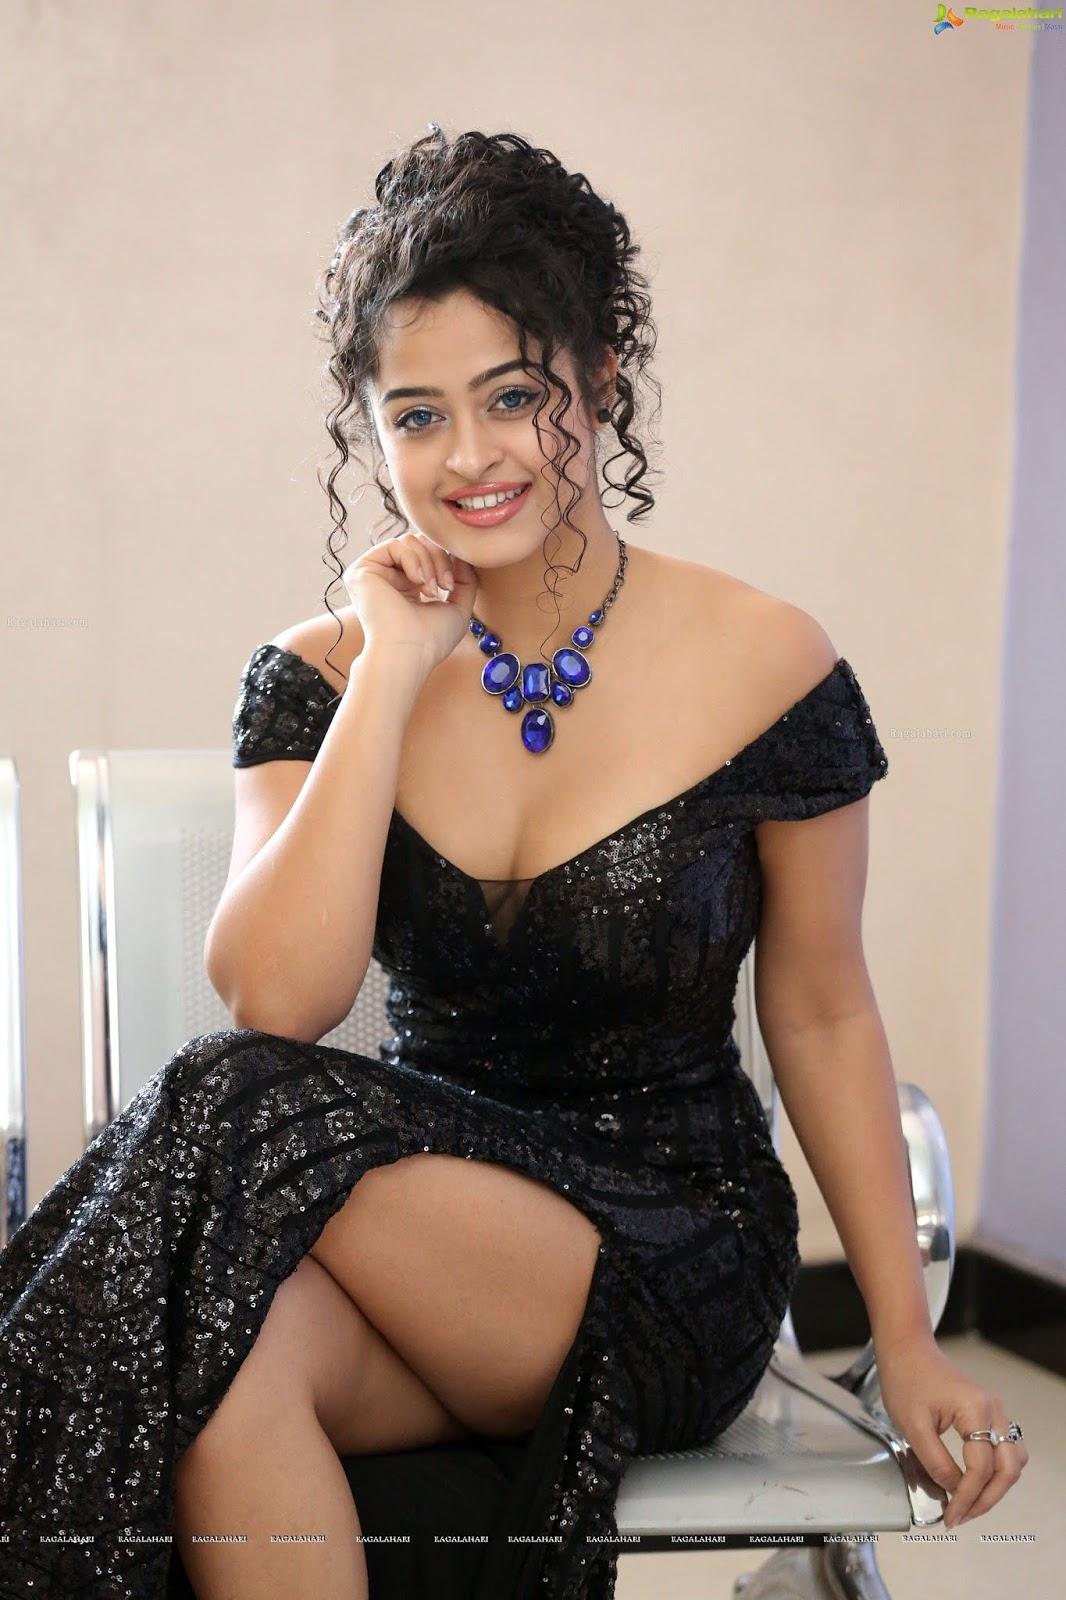 Anketa Maharana Hot in Bikini. OMG so Spicy! - Telugu ...